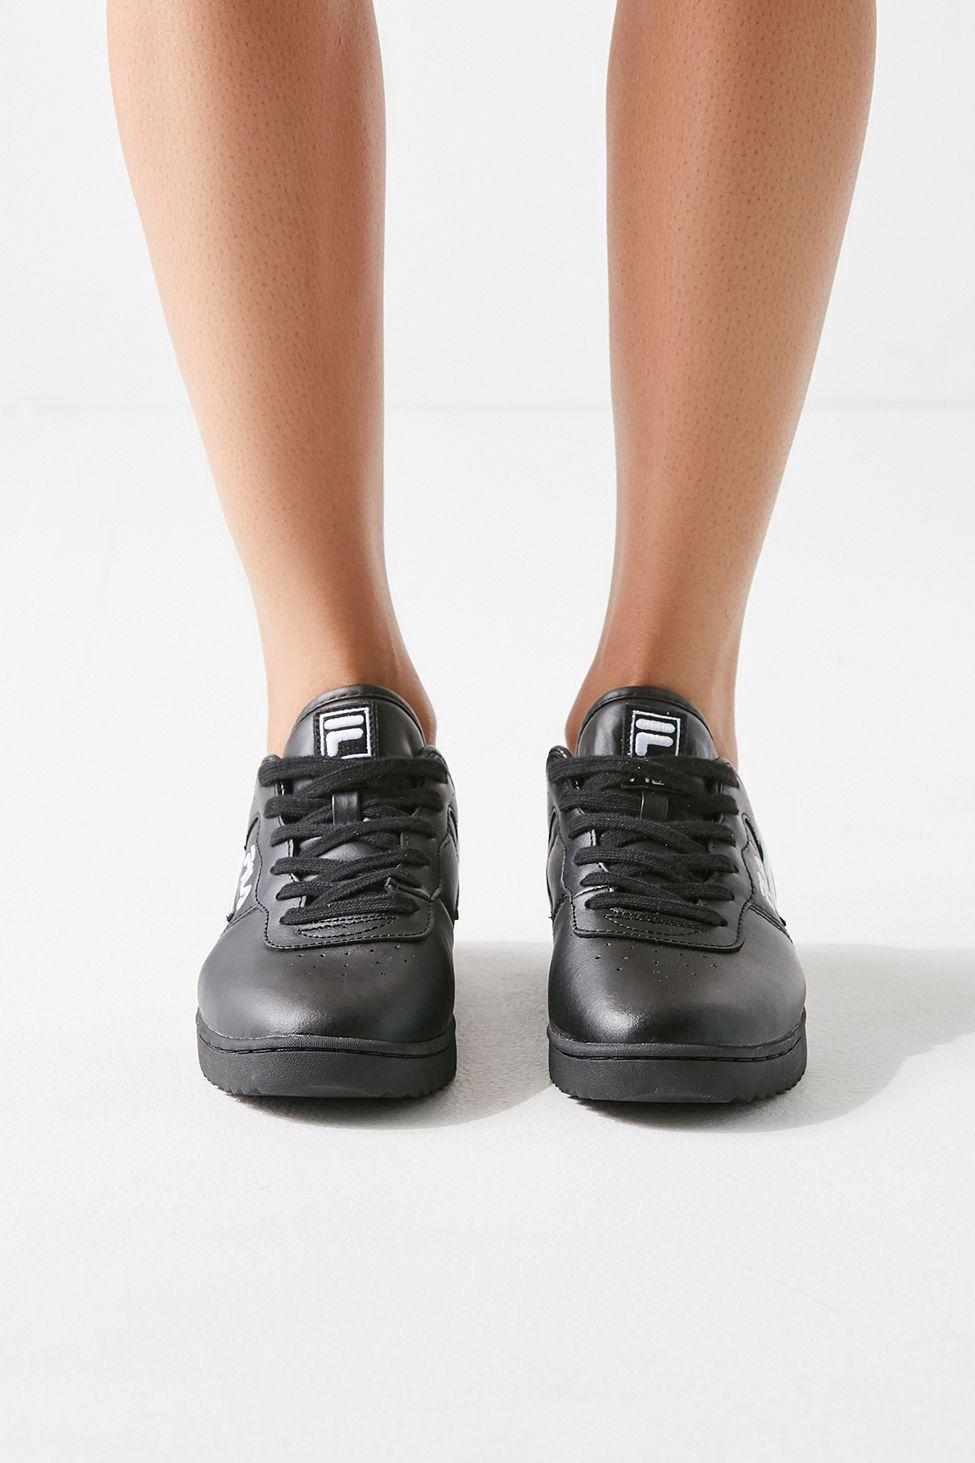 super popular 237a3 c95a8 Urban Outfitters Fila Original Fitness Ripple Sneaker - Black